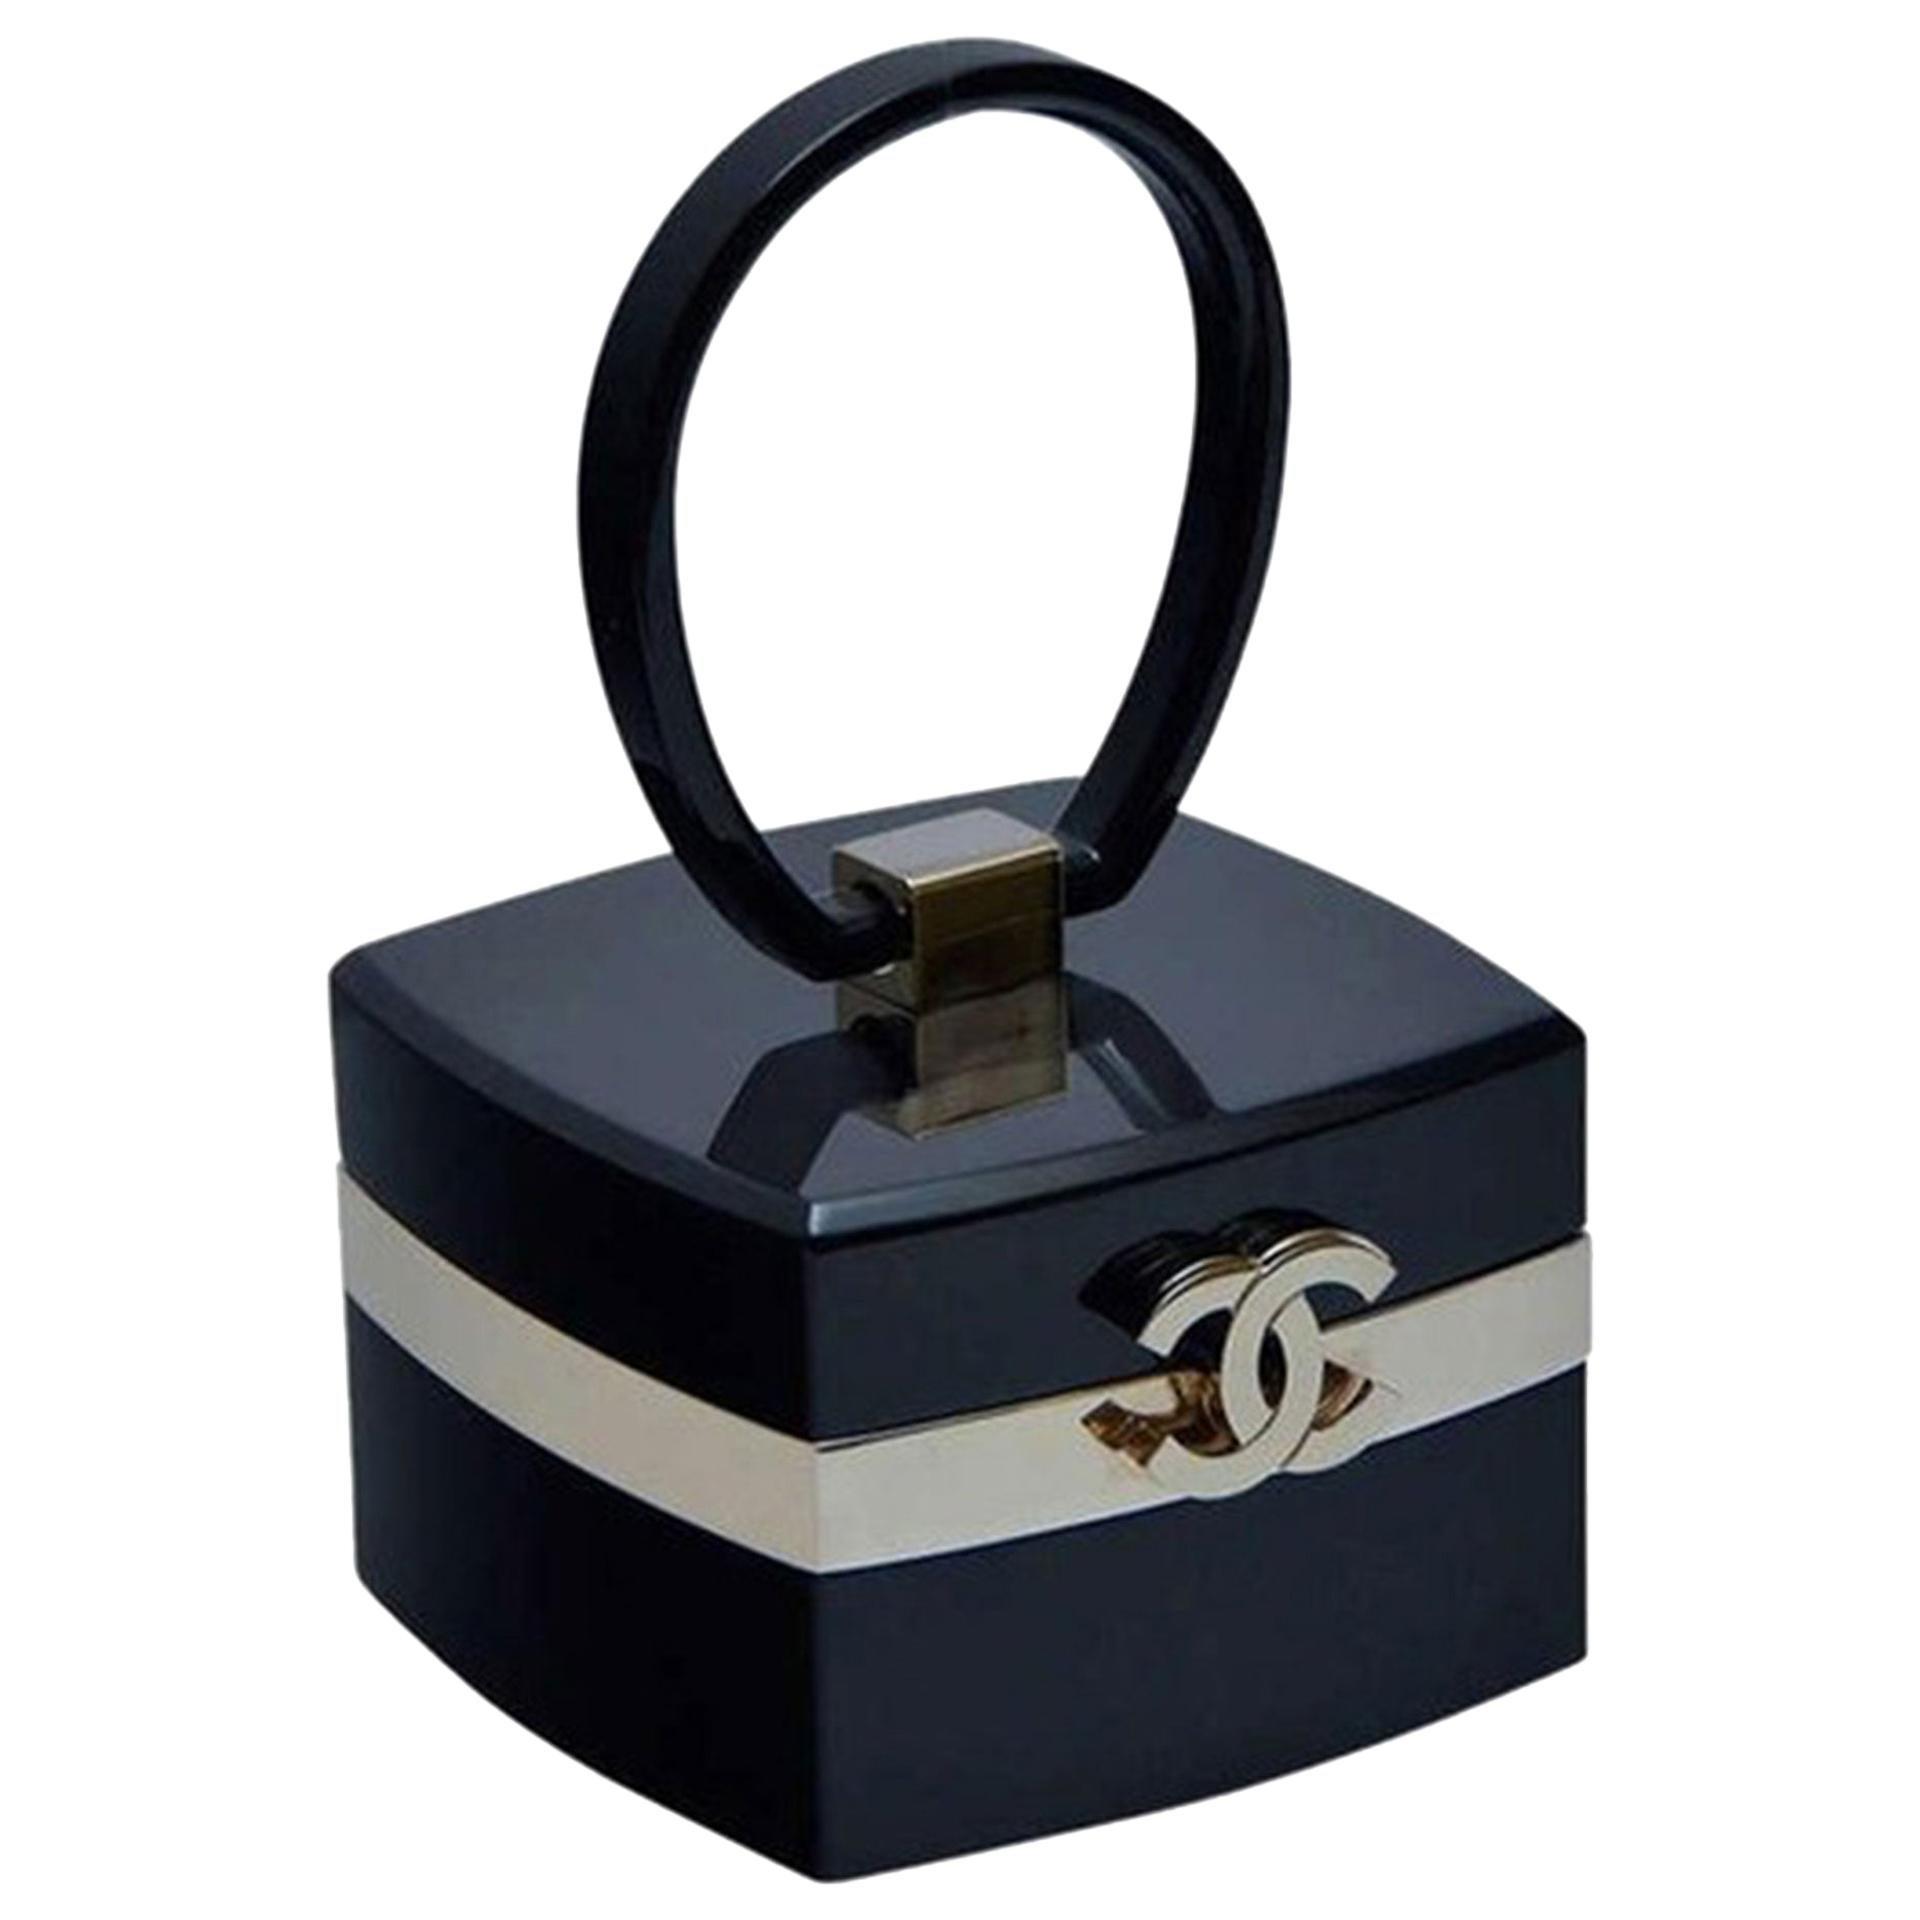 Chanel Rare Vintage Mini Trunk Vanity Case Minaudière Black Lucite Small Clutch